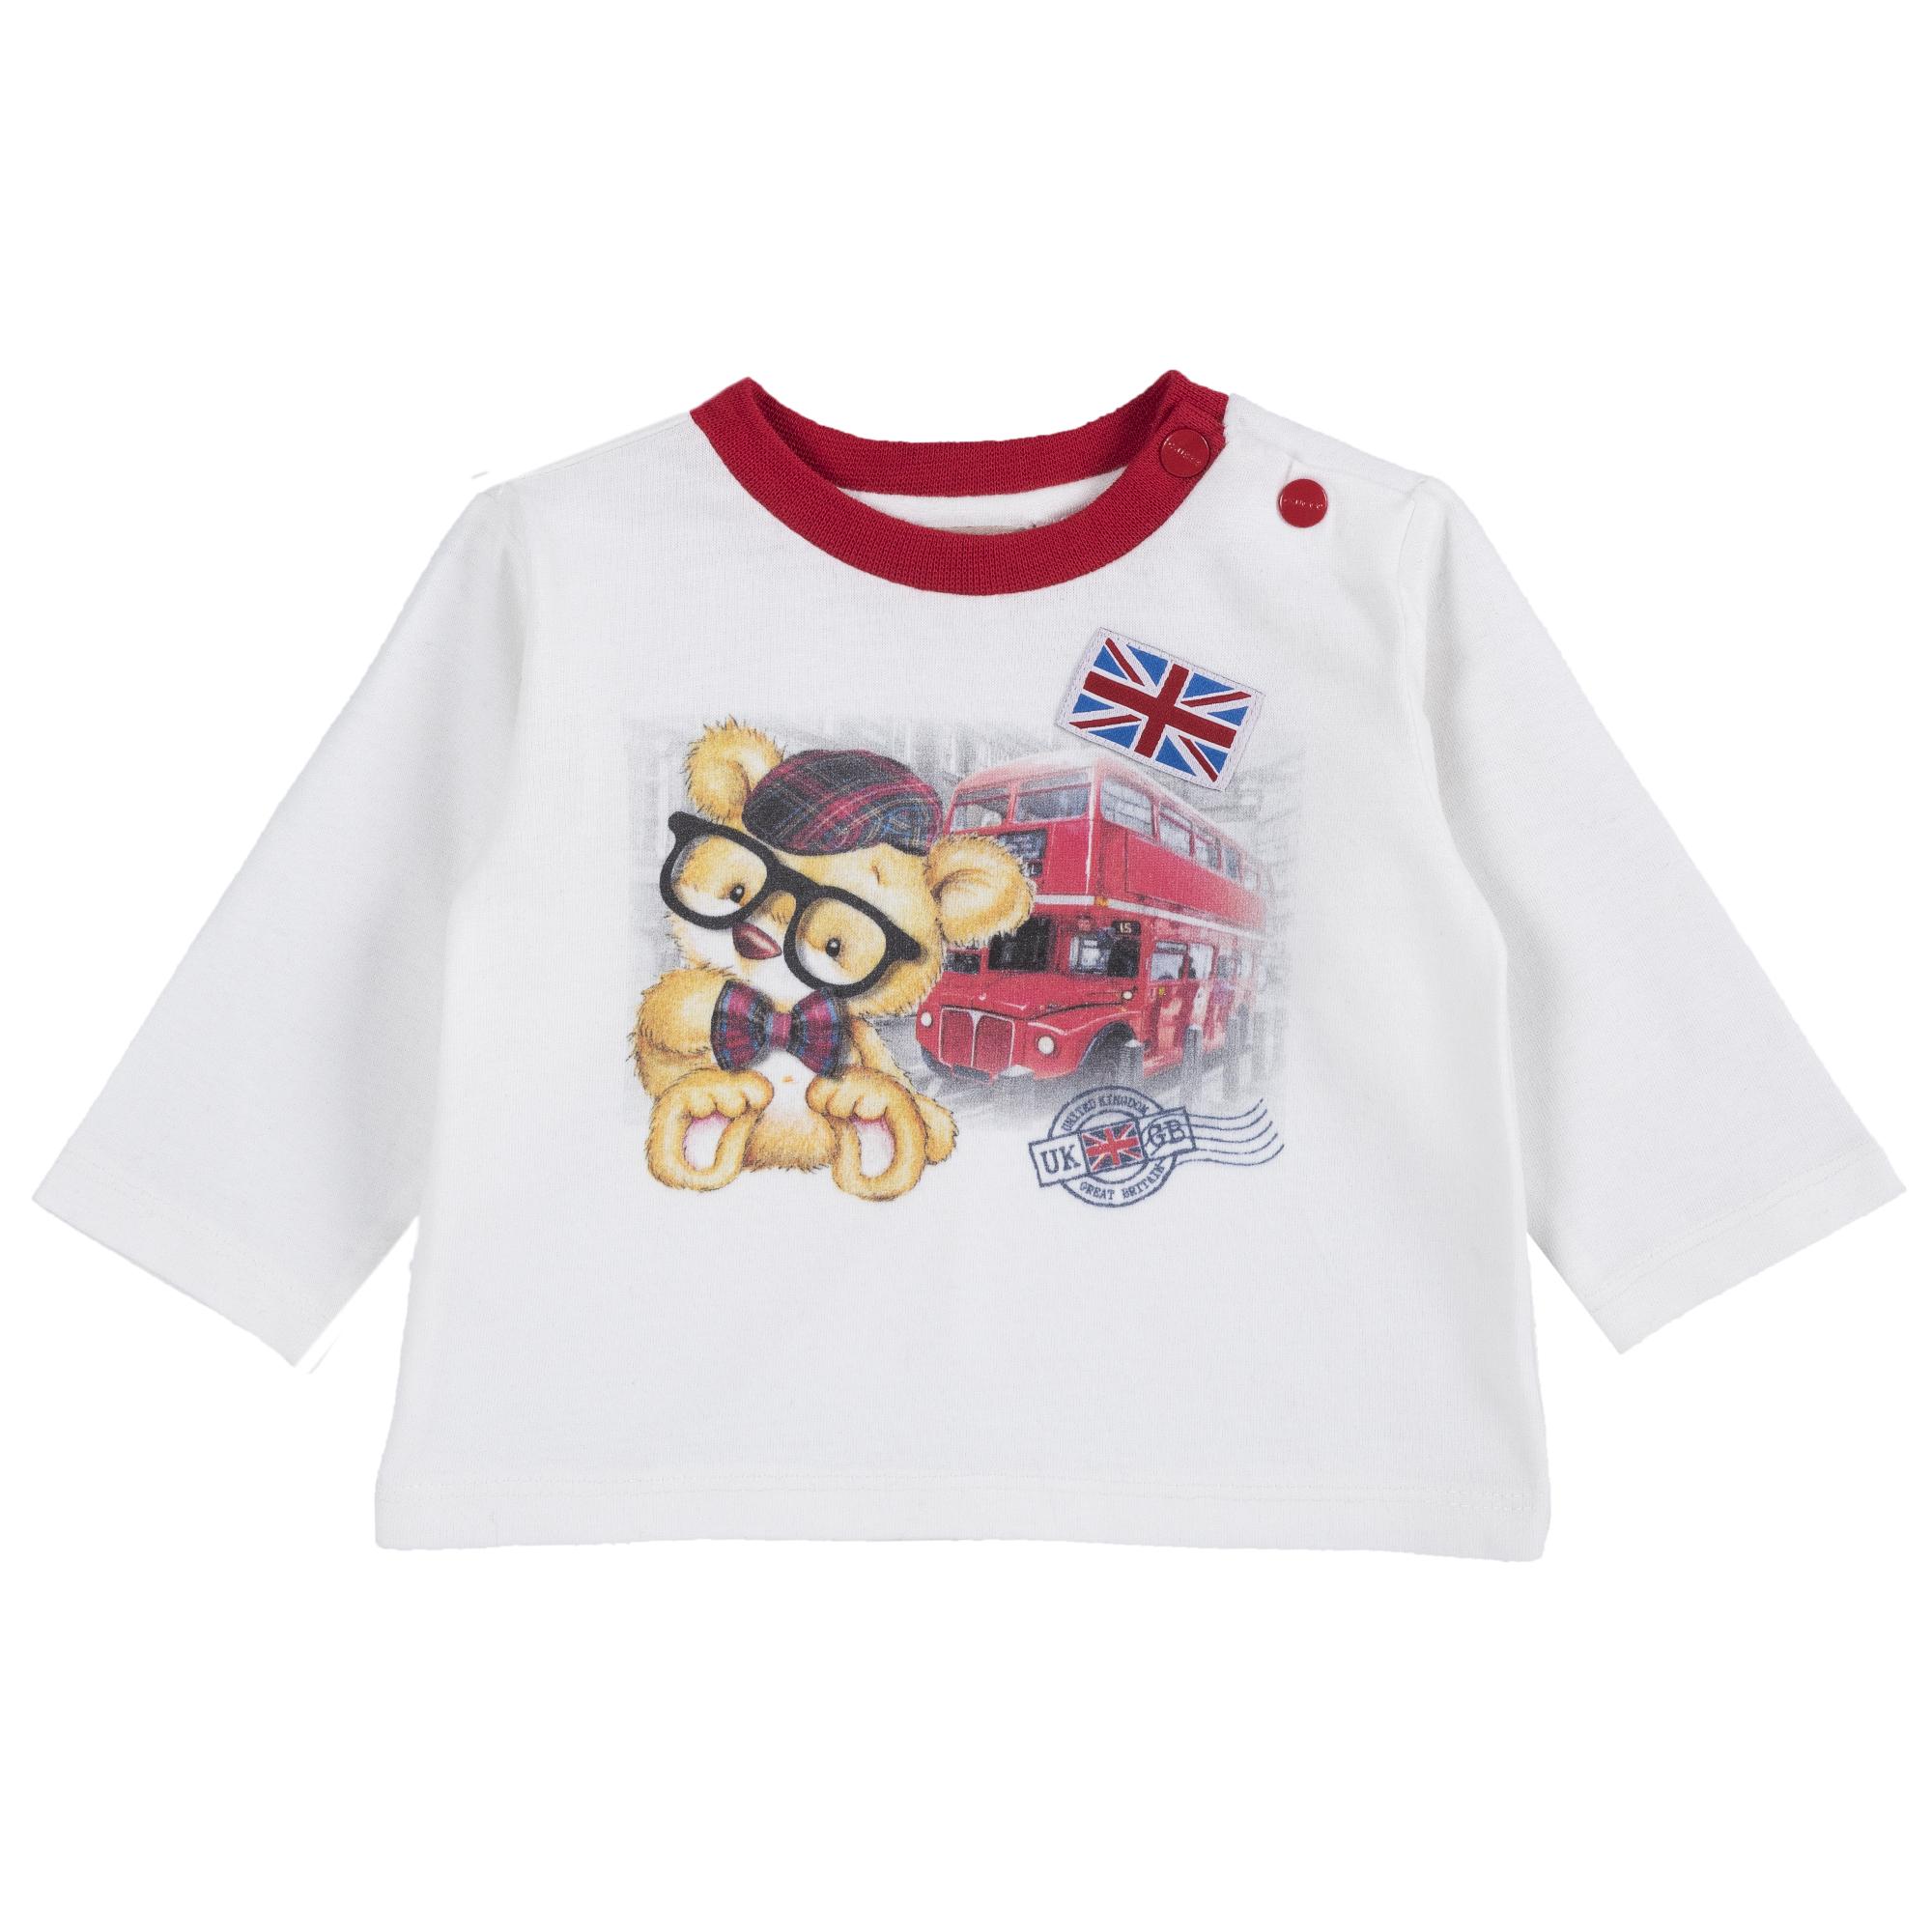 Tricou copii Chicco, alb, 06478